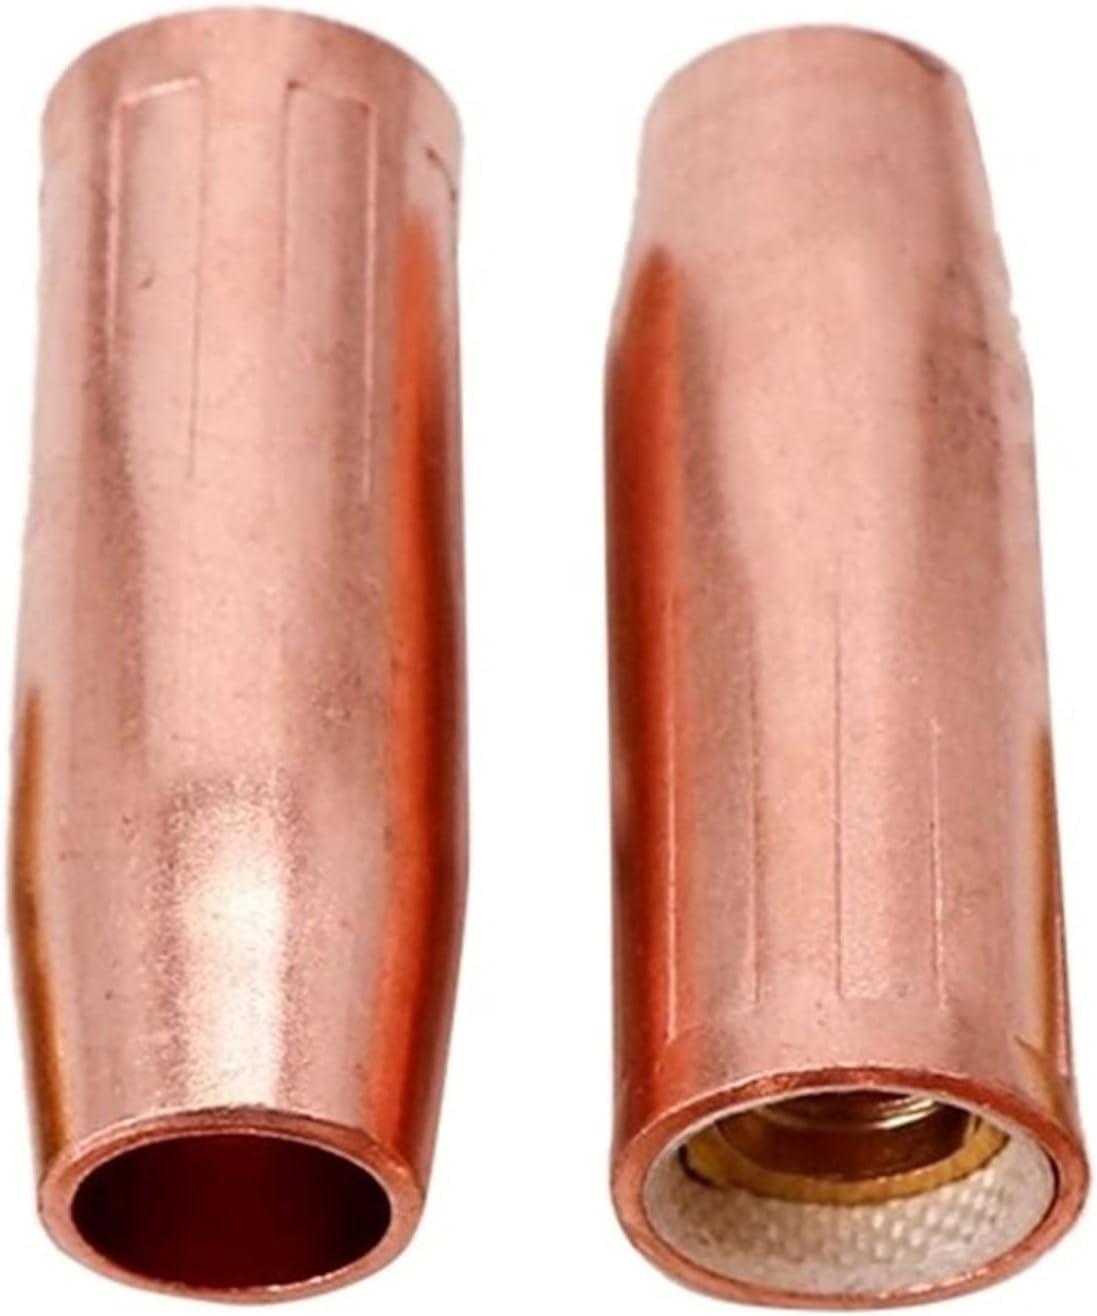 Welding Torch Tip Ultra-Cheap Deals M6 For Binzel Nozzle Gas 20pcs New product